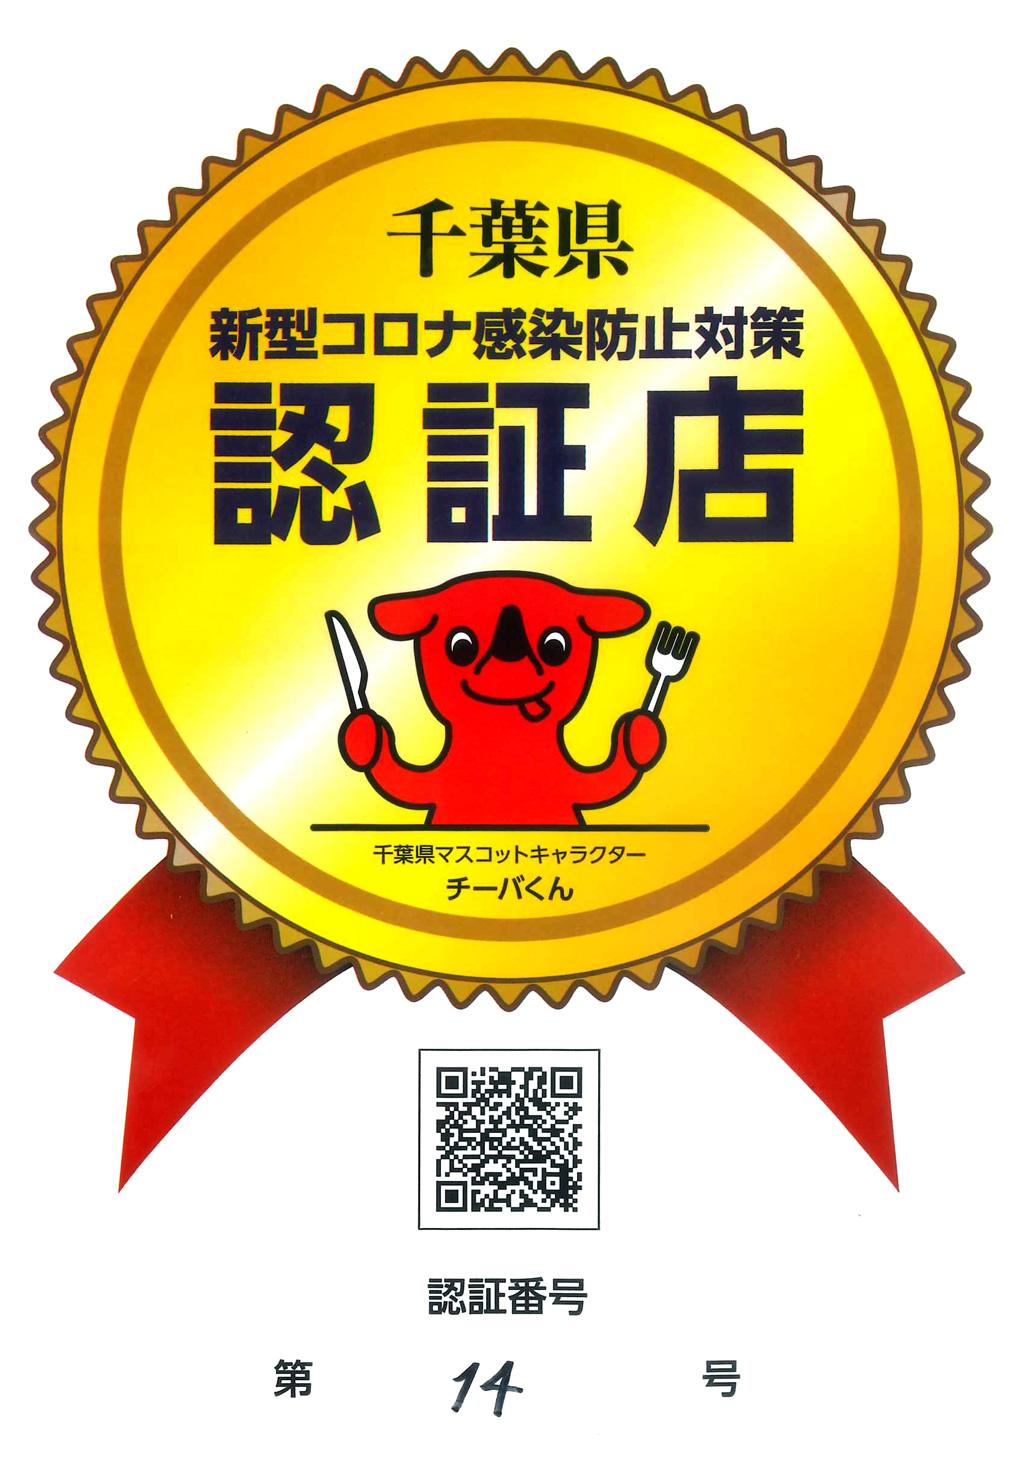 千葉県新型コロナ感染防止対策認証店